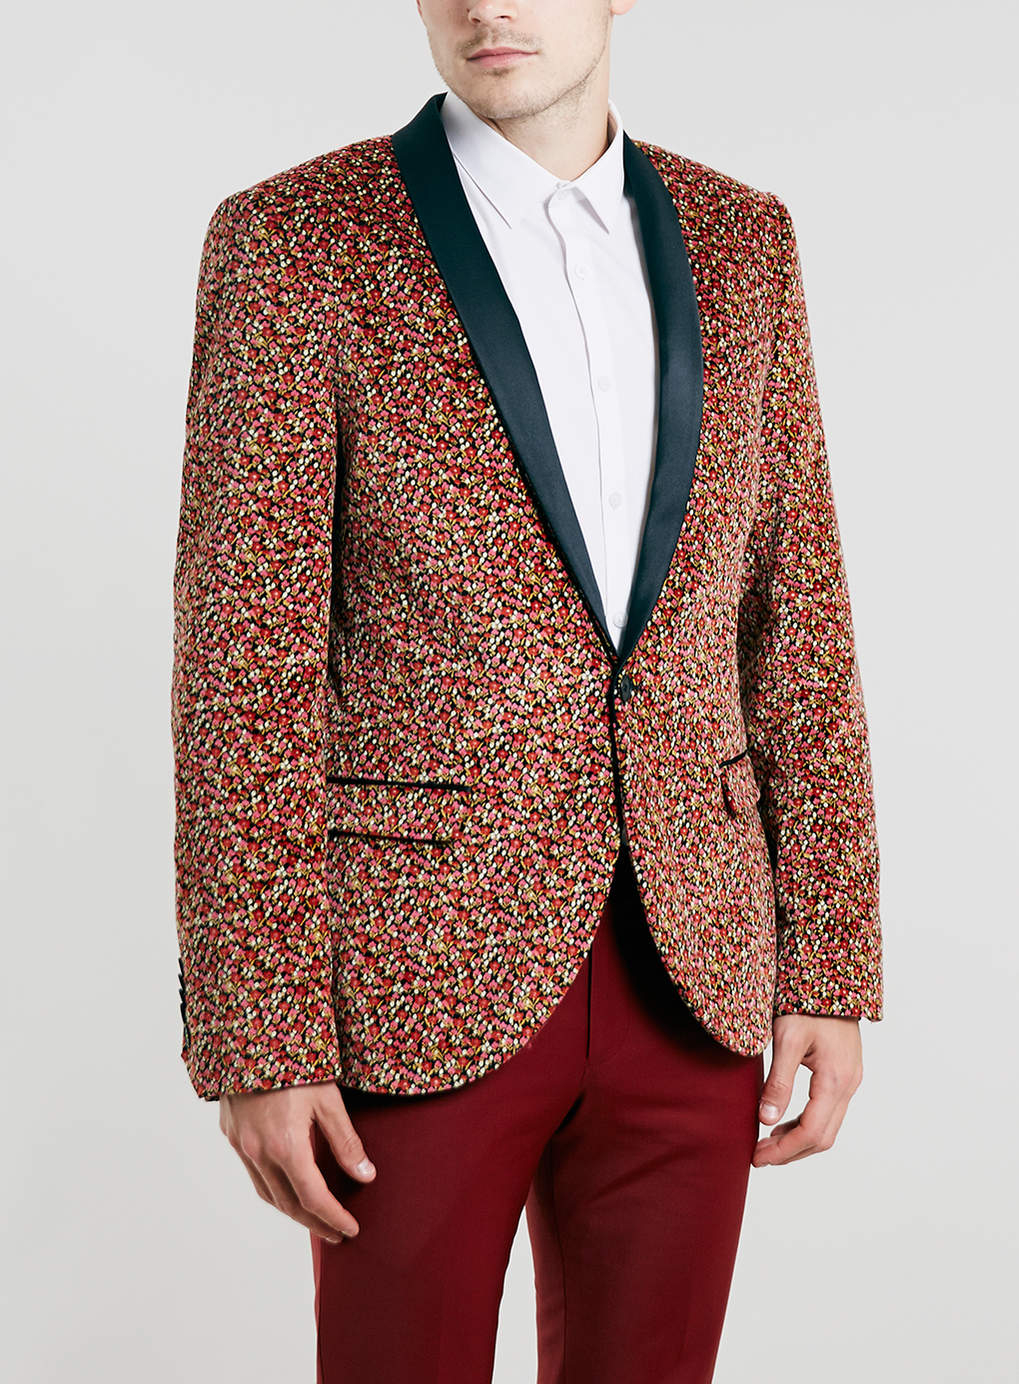 Topman Noose And Monkey Floral Velvet Blazer In Multicolor